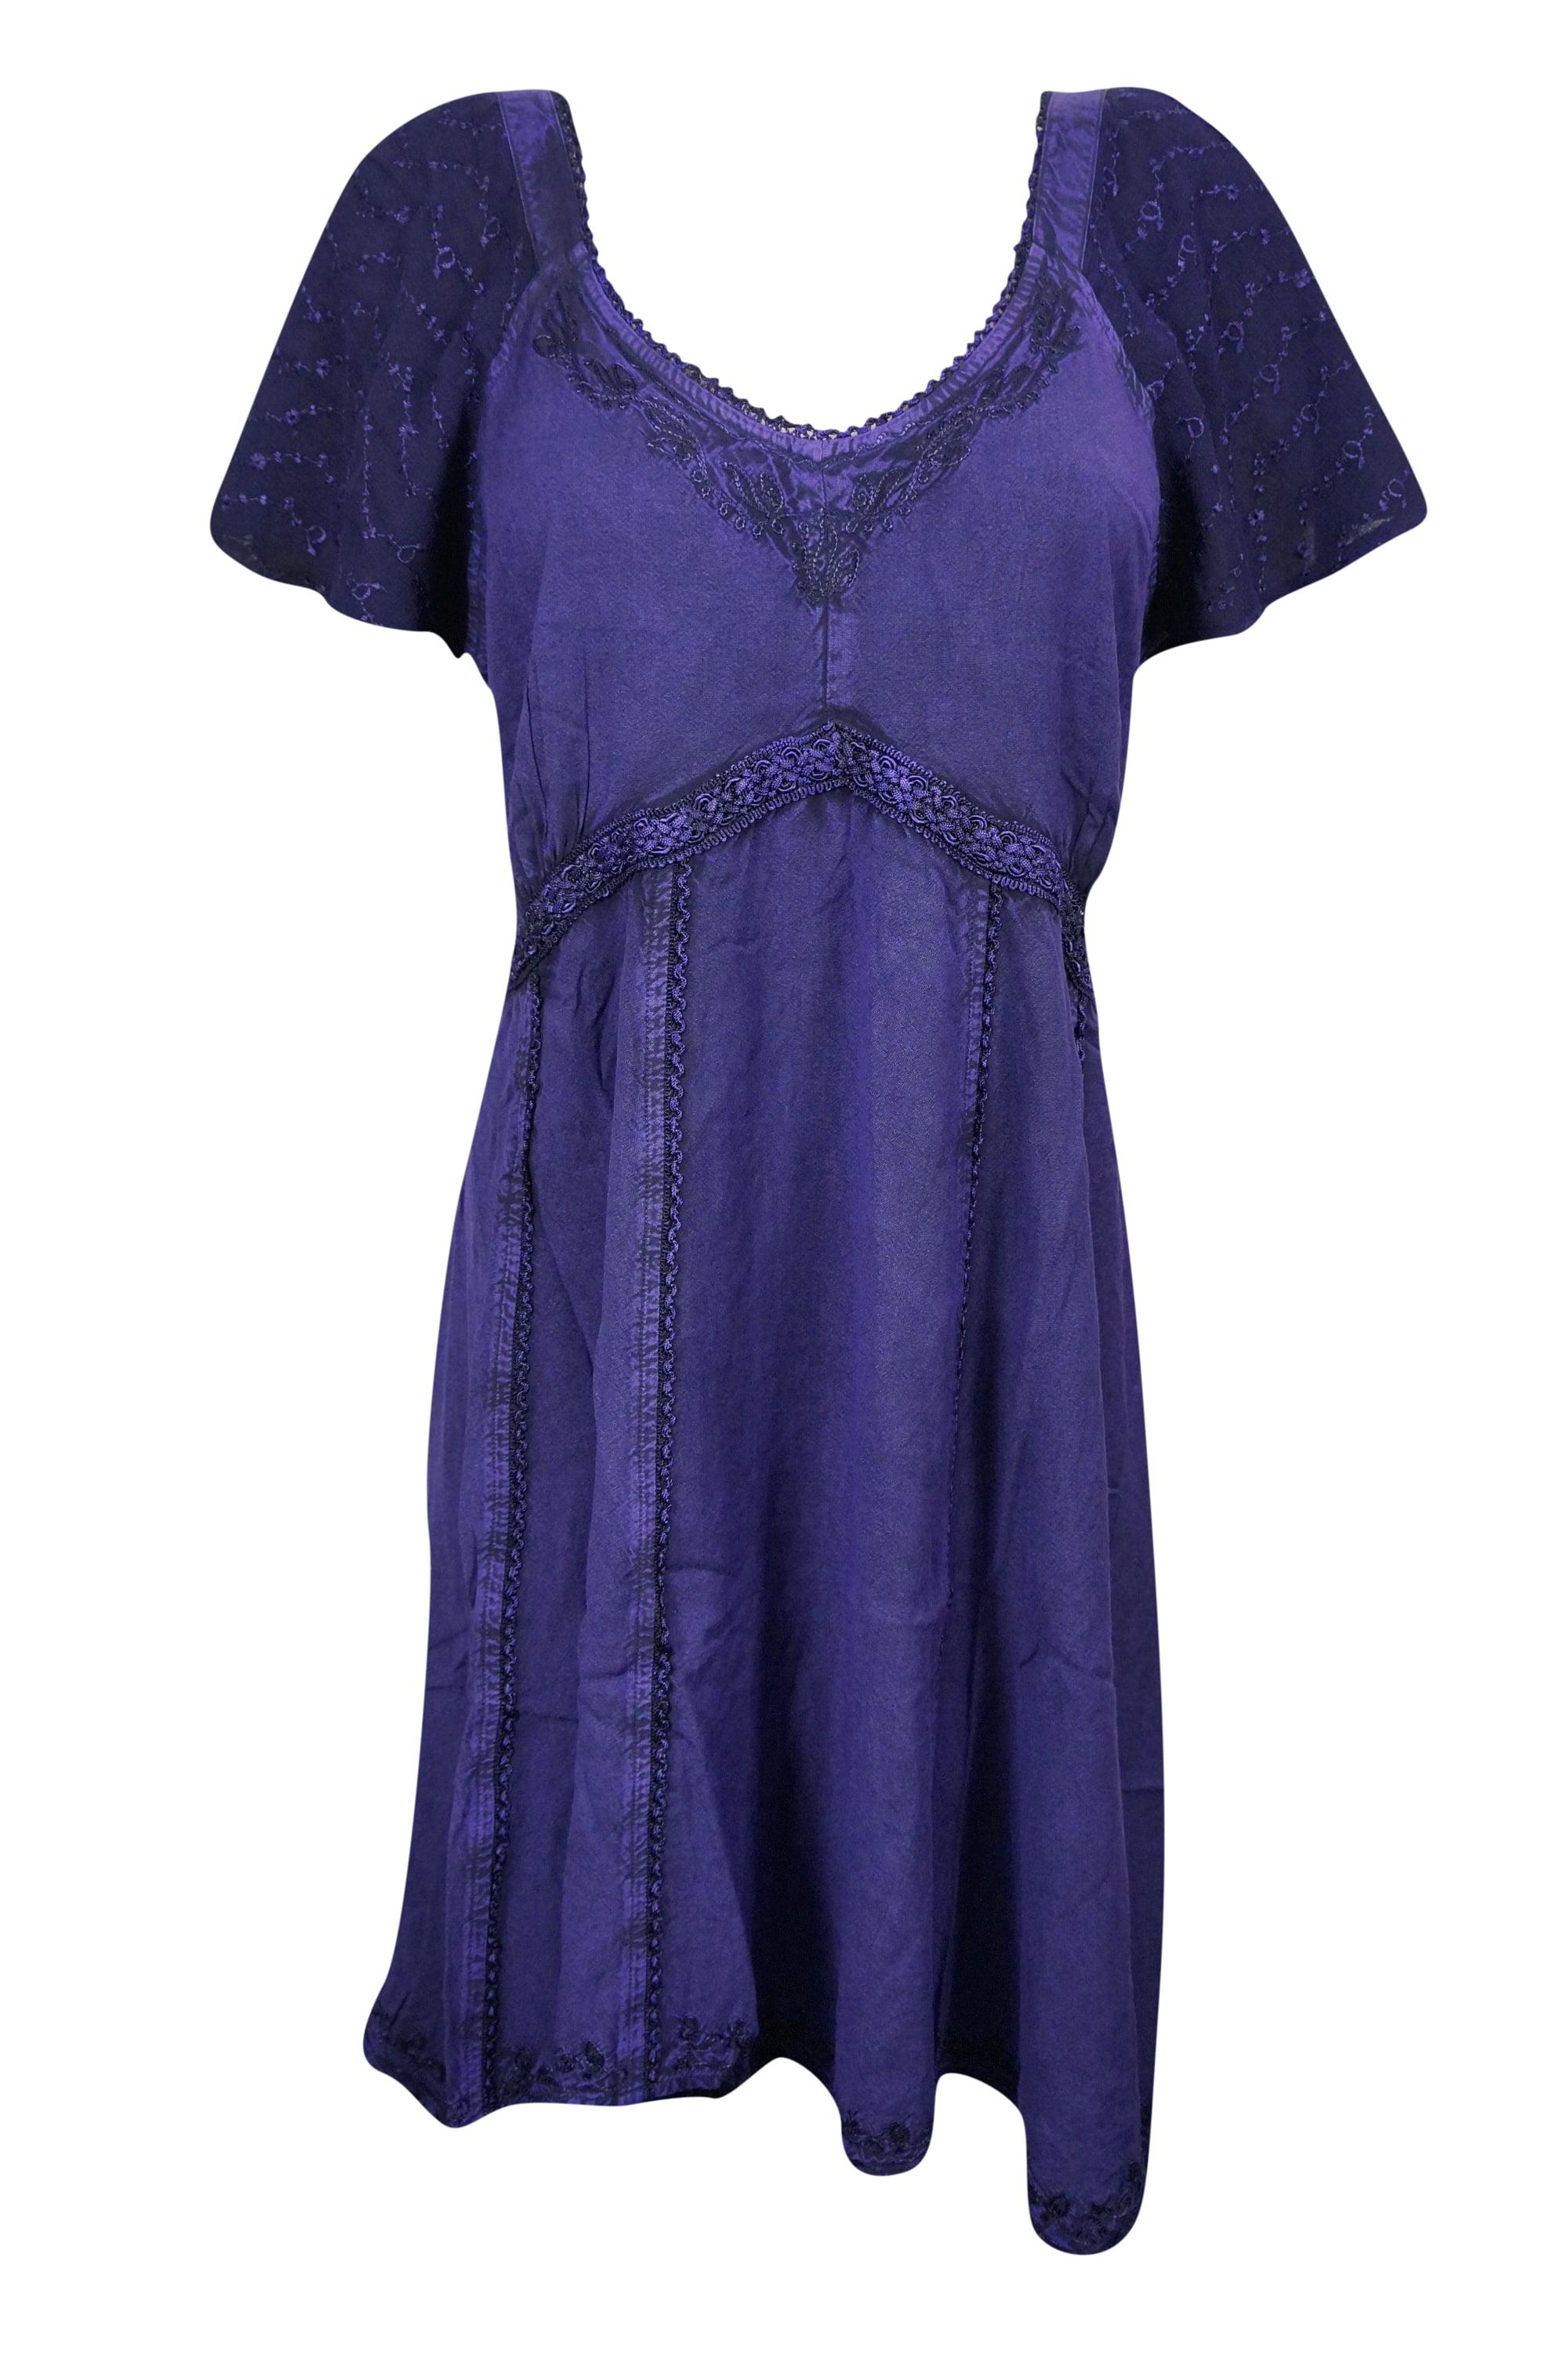 b647dc5df4bc Mogul Interior - Mogul Women s Summer Dress Embroidered Bell Sleeves Purple  Sundress S - Walmart.com